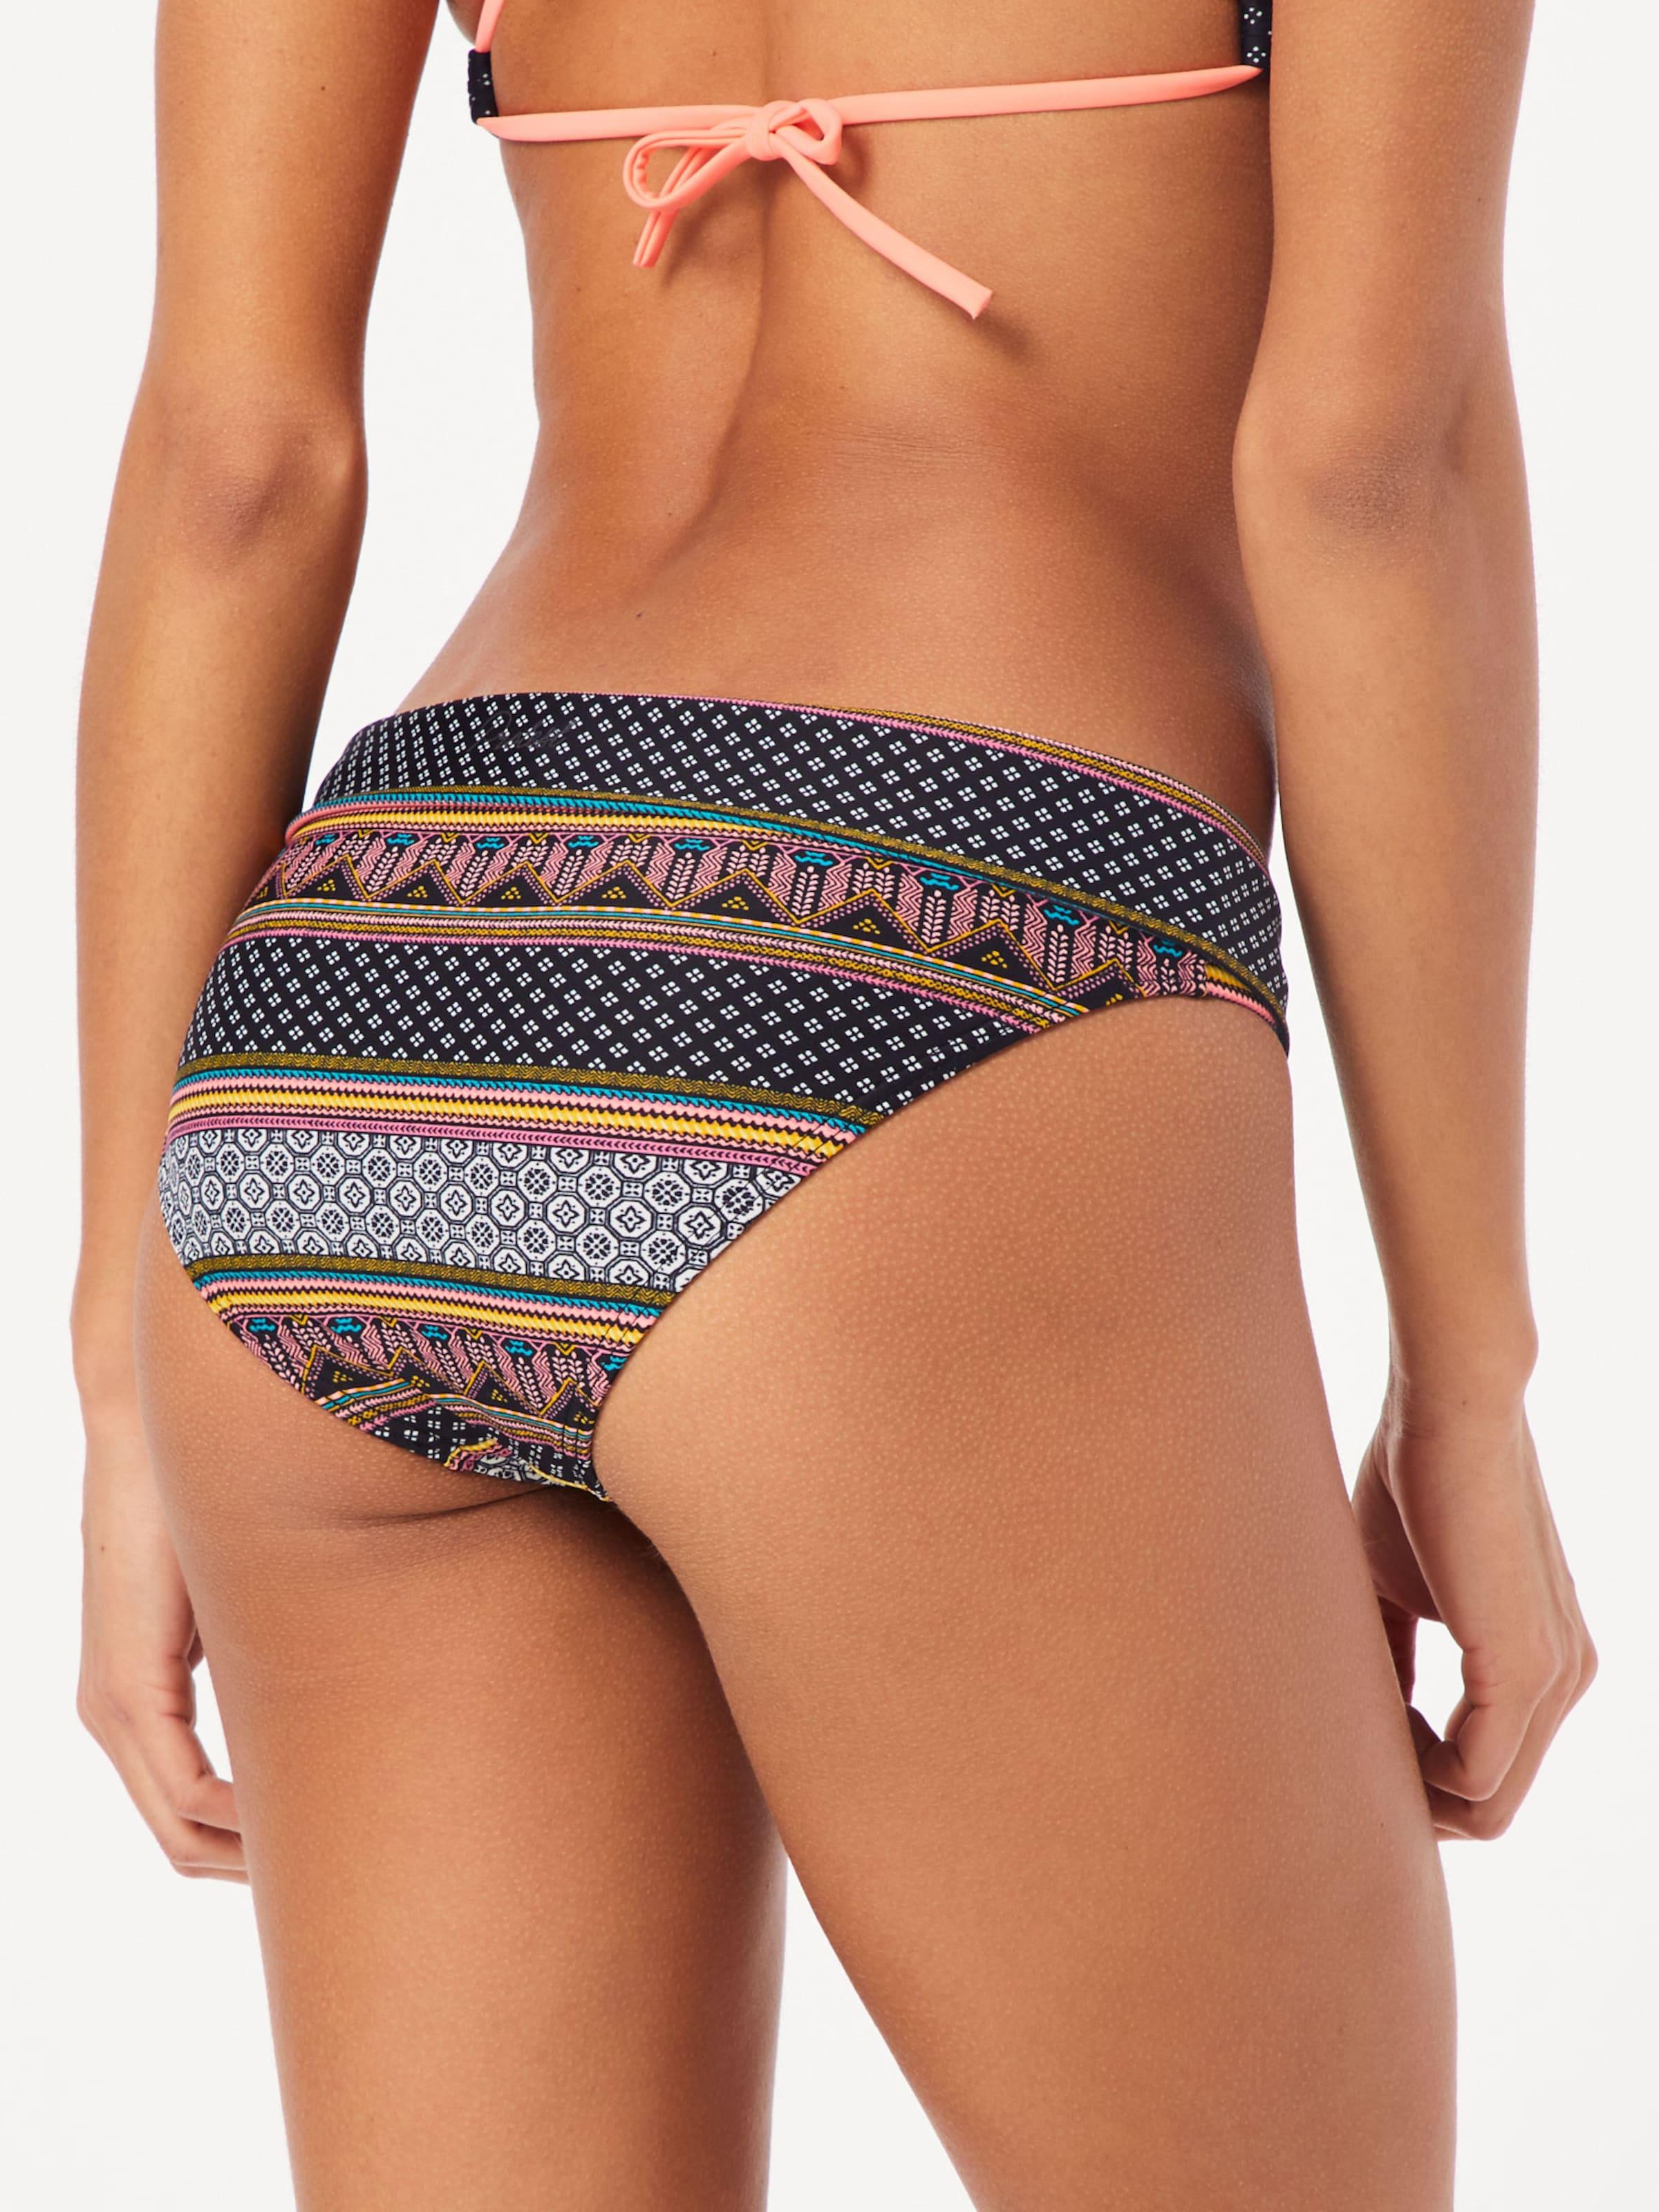 Bikini Protest GrauPfirsich Schwarz 19 'mm Bikinihose Zucci Bottom' In ZXiukOPT